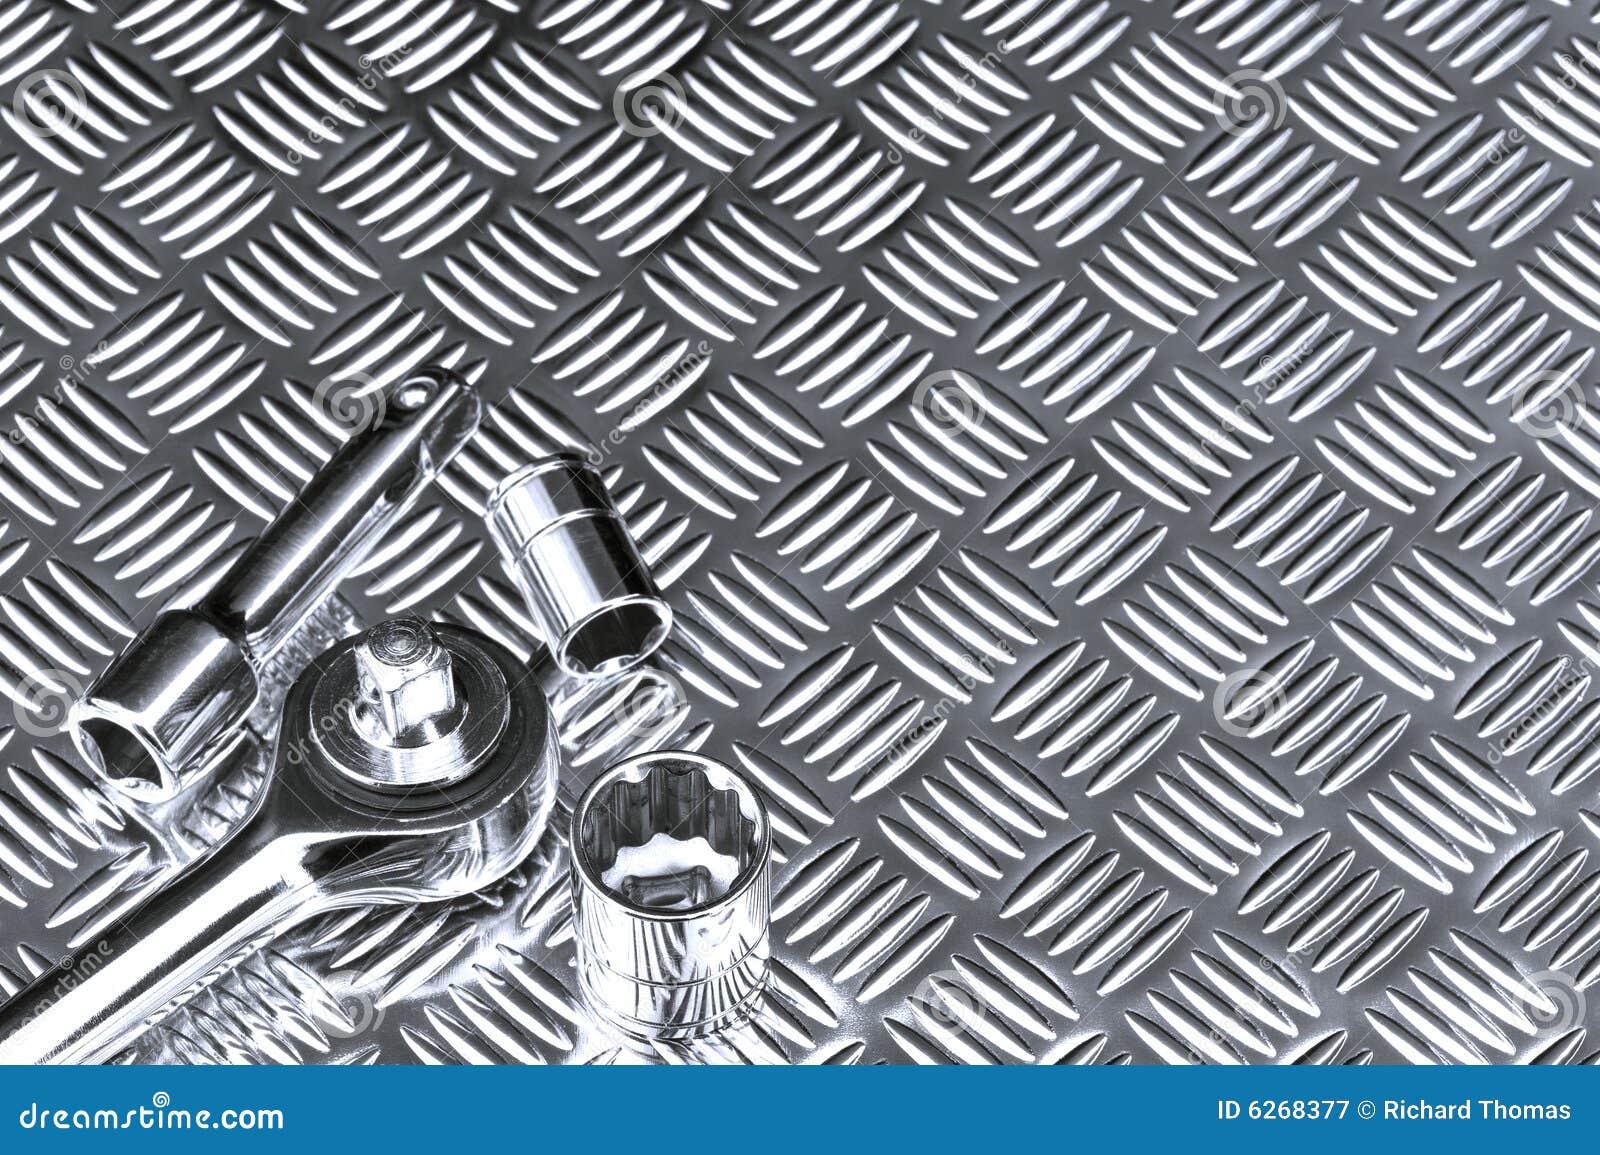 Mechanical Socket Background Stock Image Of Object